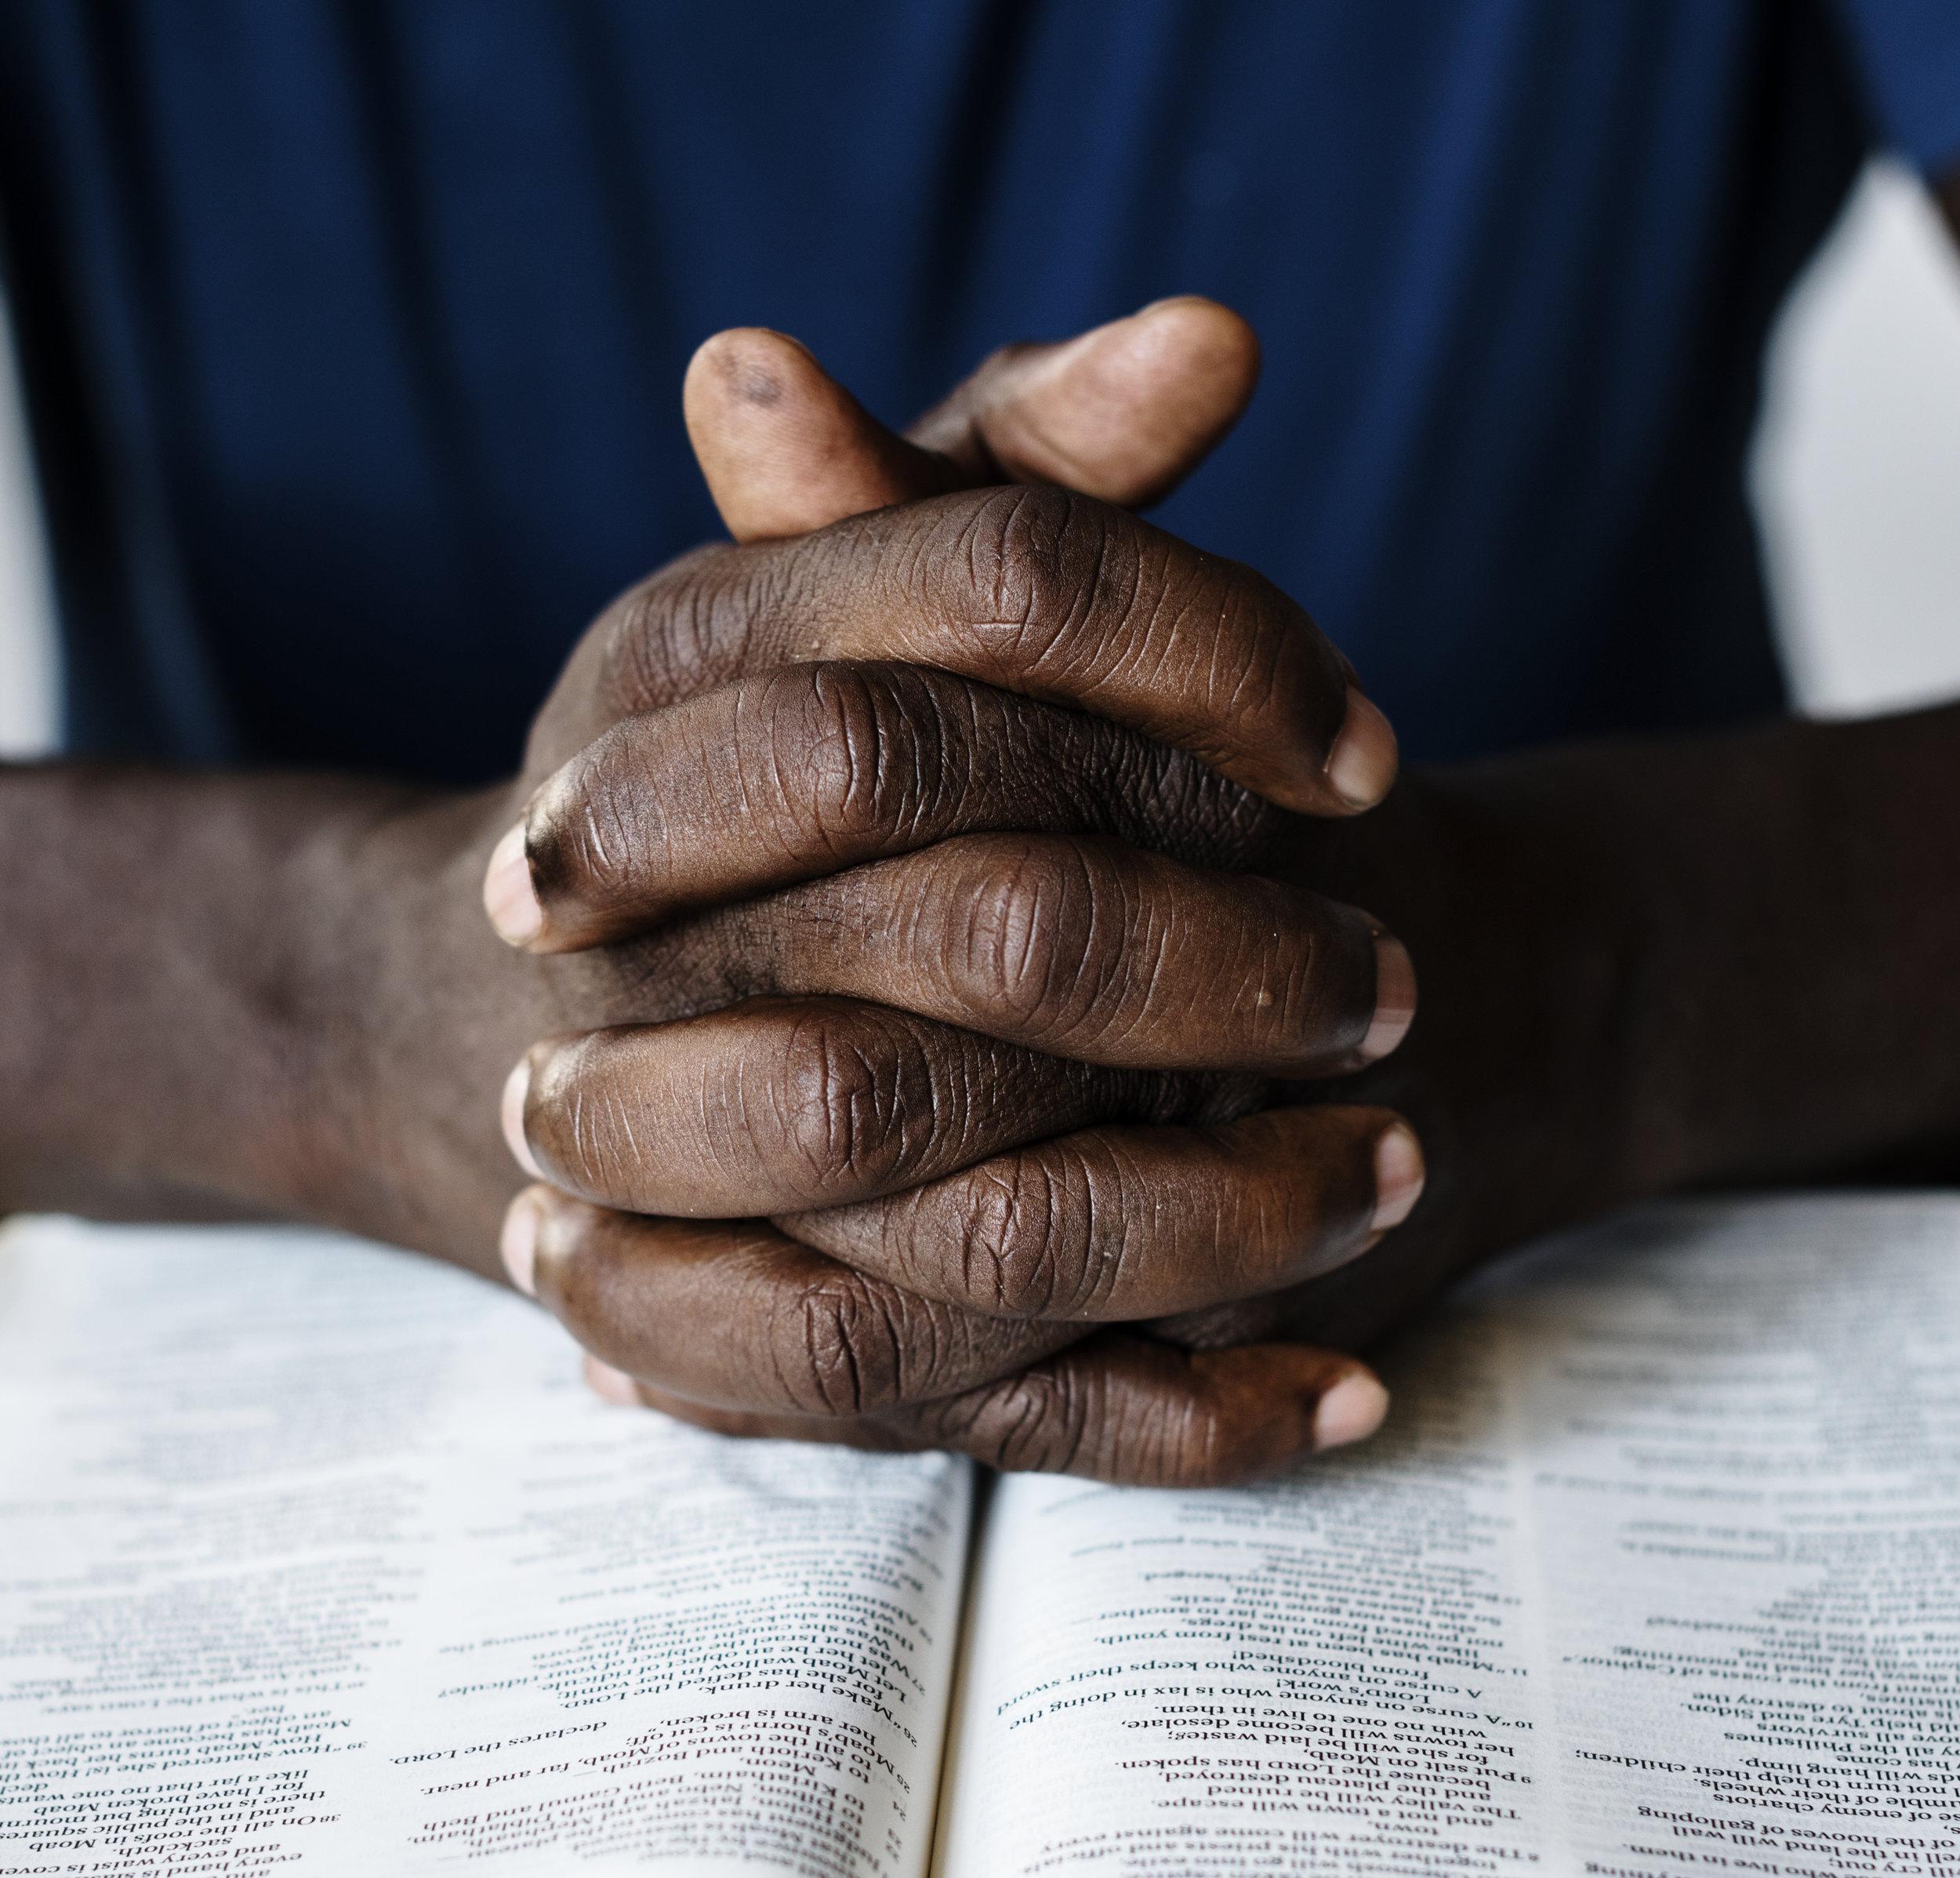 KBMS - Kenya Baptist Missionary Service